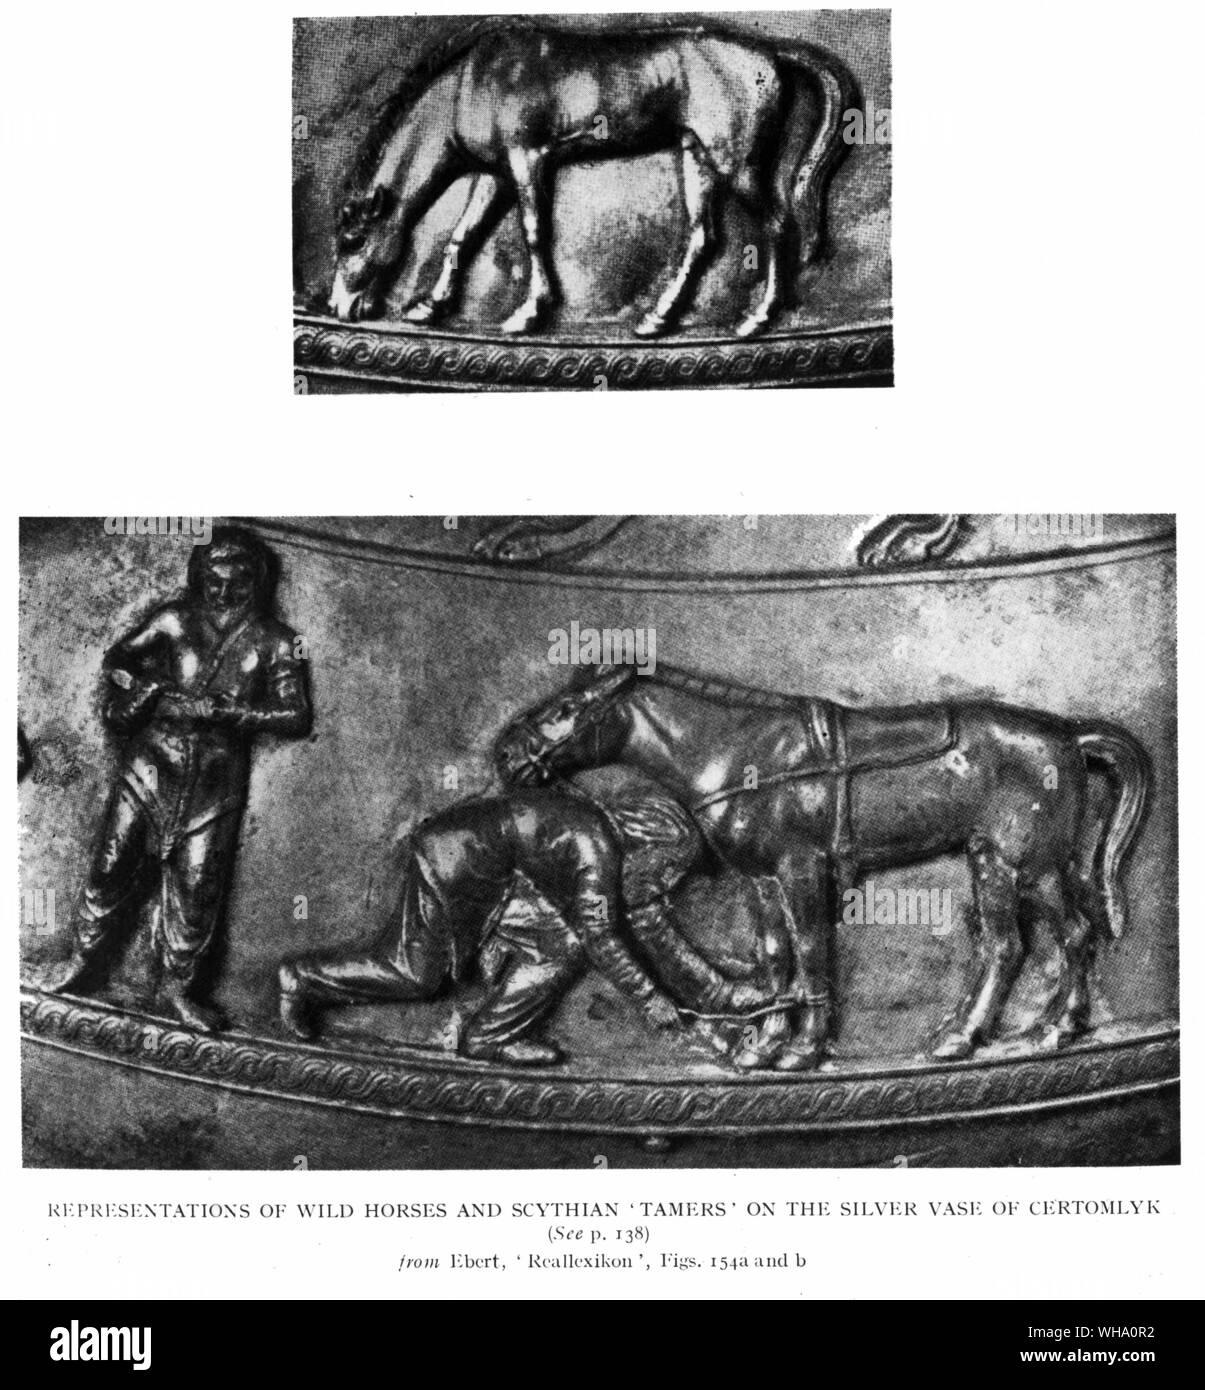 Scythian horse-tamers and wild horses from Certomlyk, Ukraine, 4th Century BC. Stock Photo